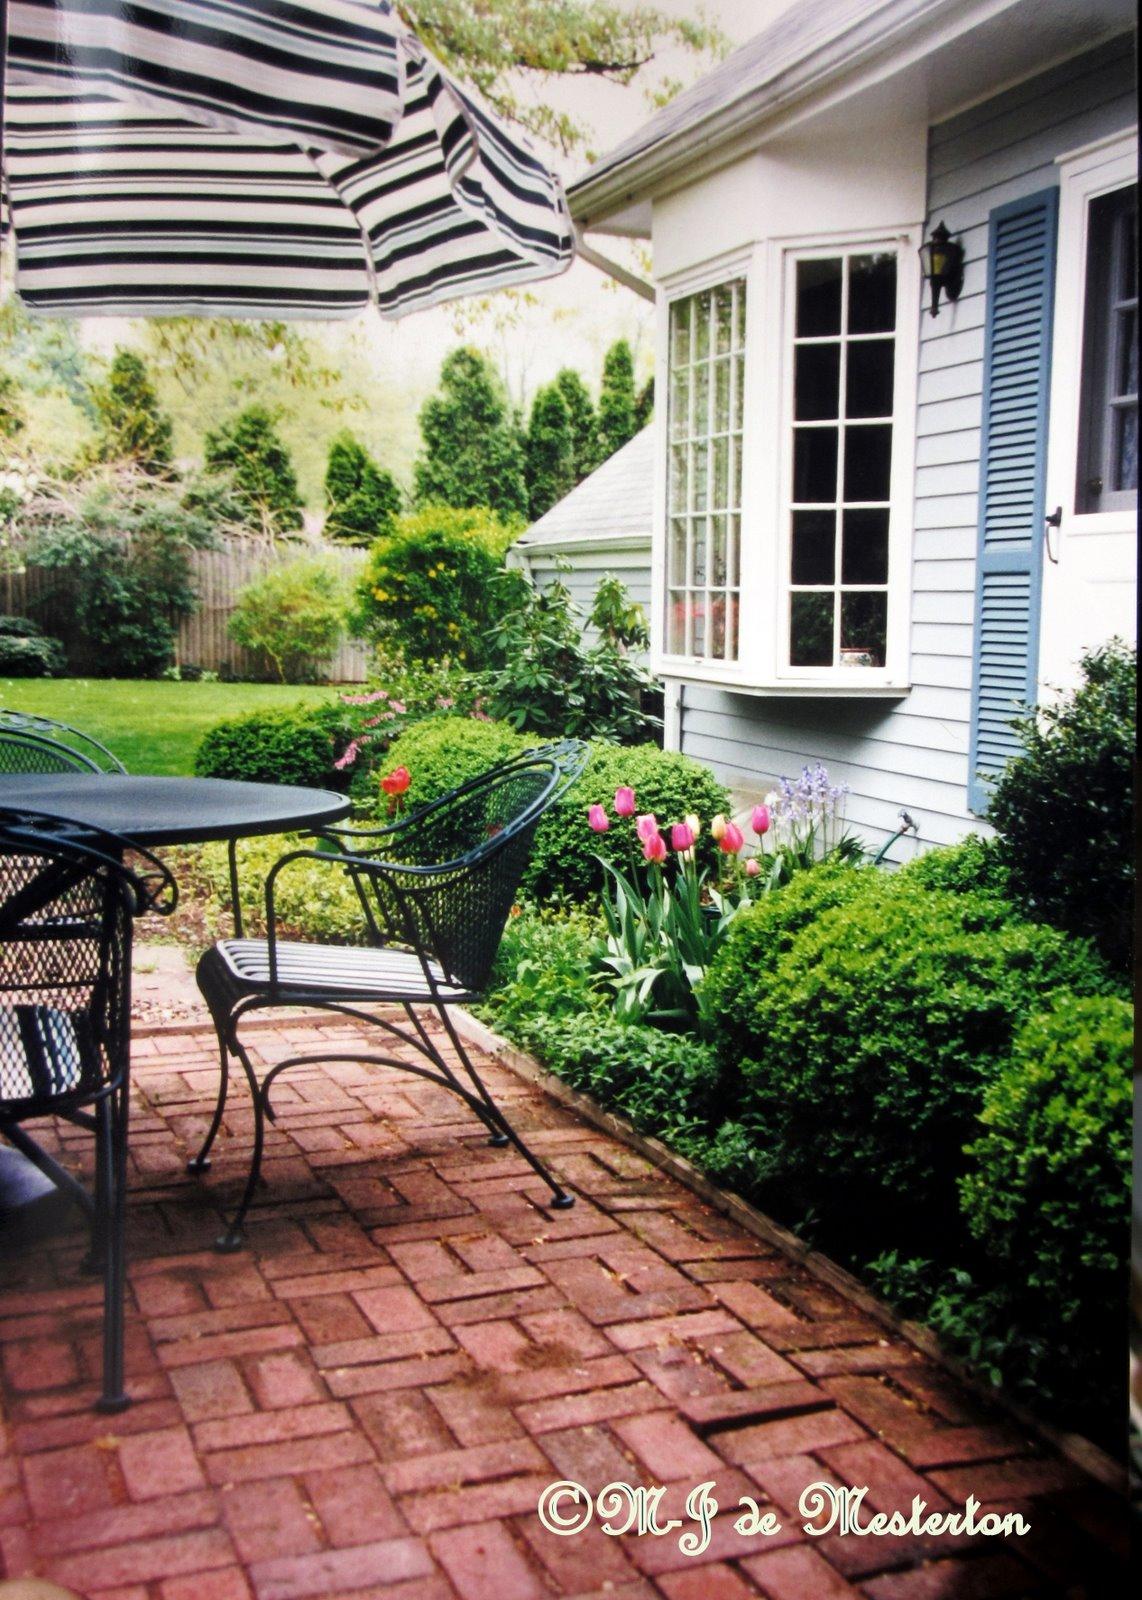 Elegant landscaping elegant hardy boxwood shrubbery for Elegant landscaping